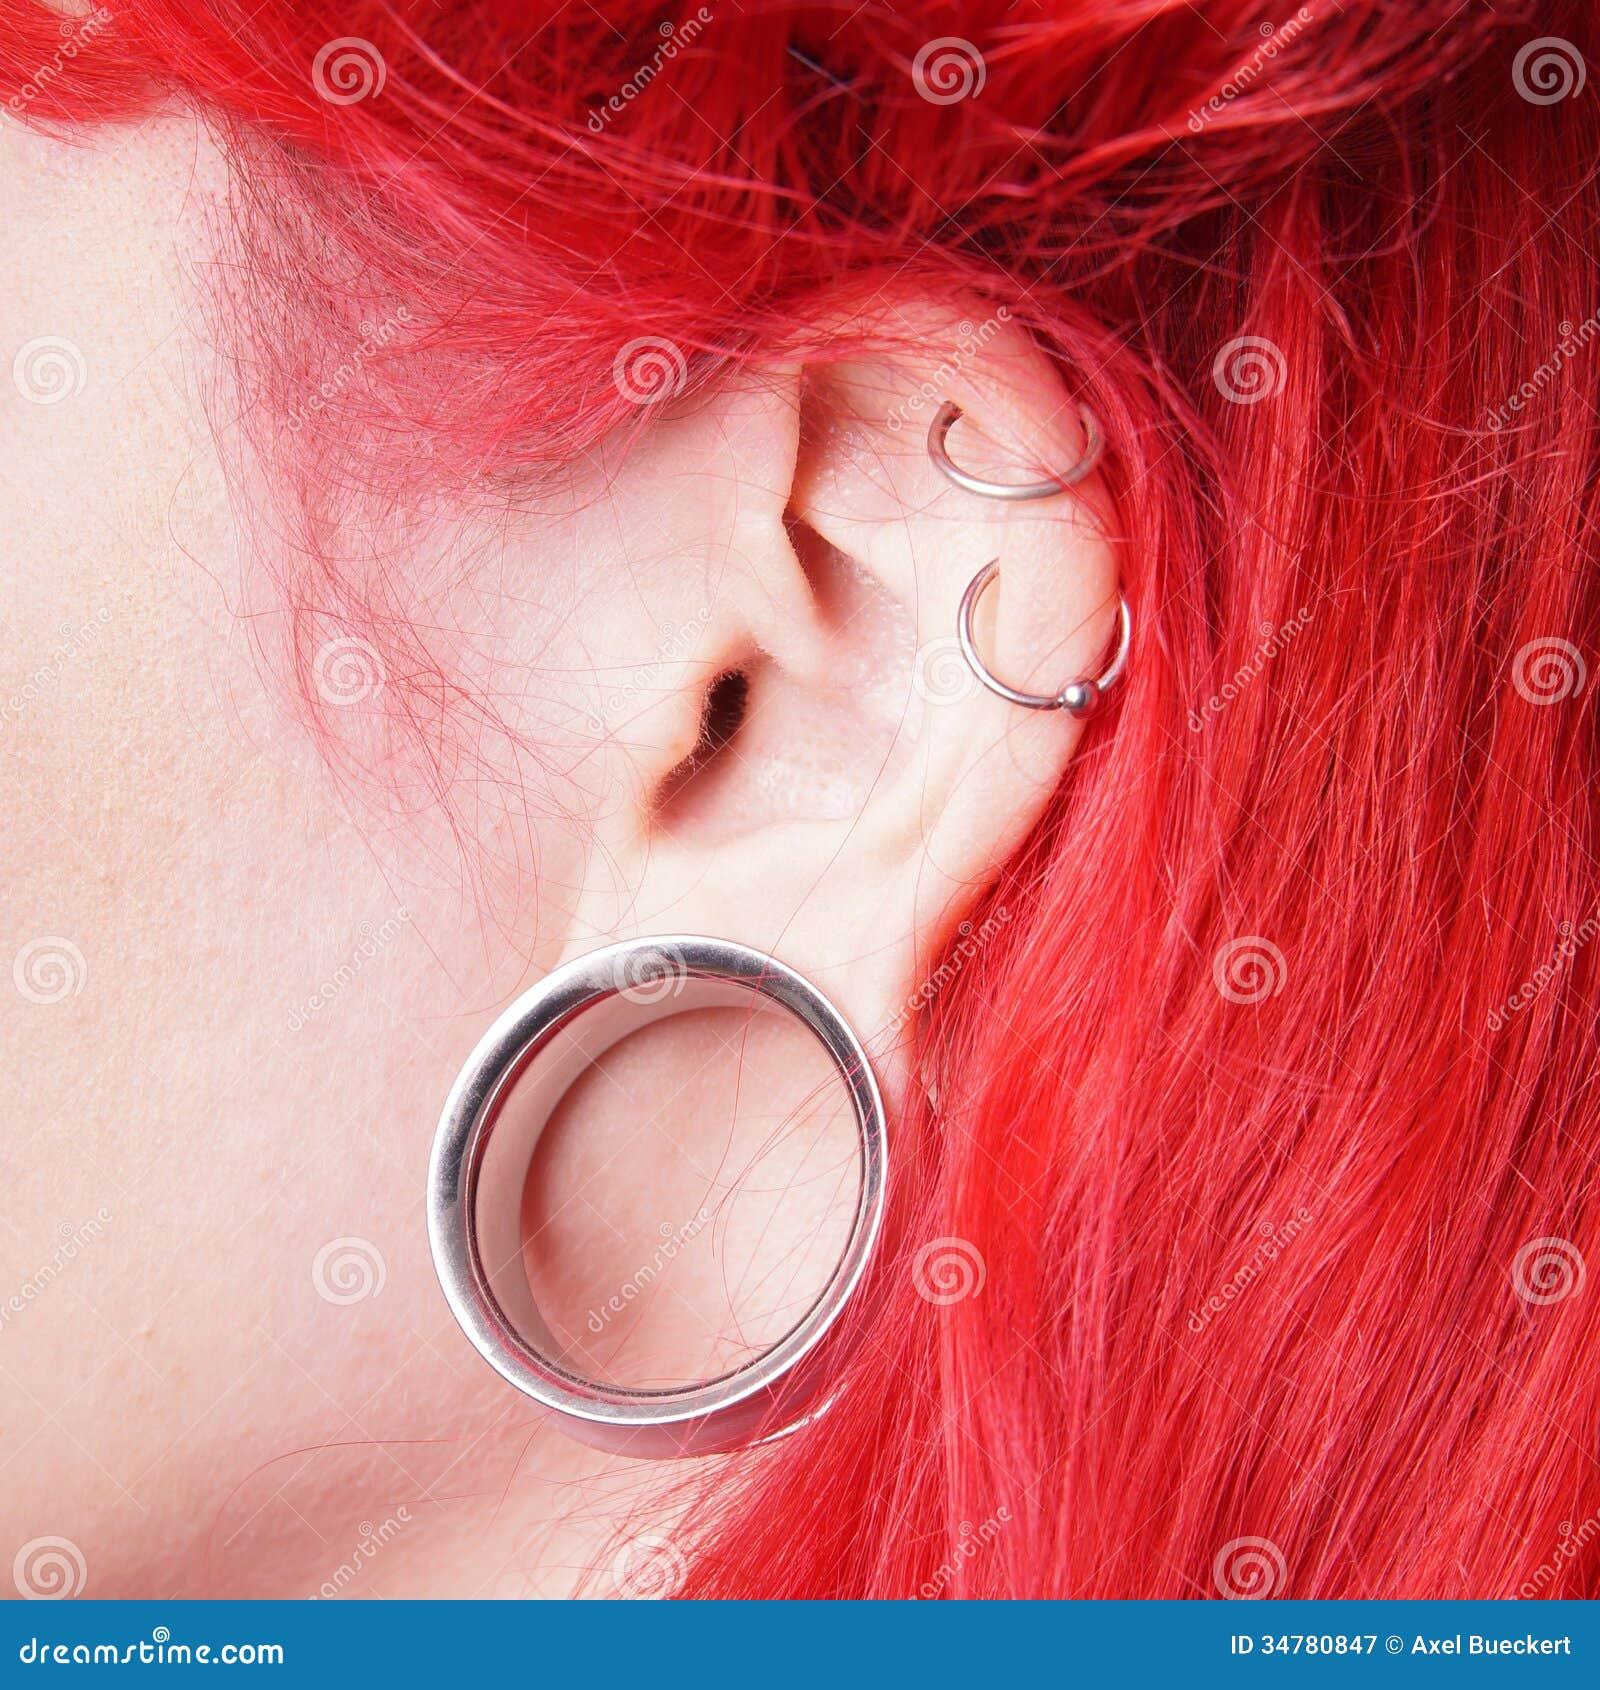 Flesh Tunnel Stock Image Image Of Earring Alternative 34780847